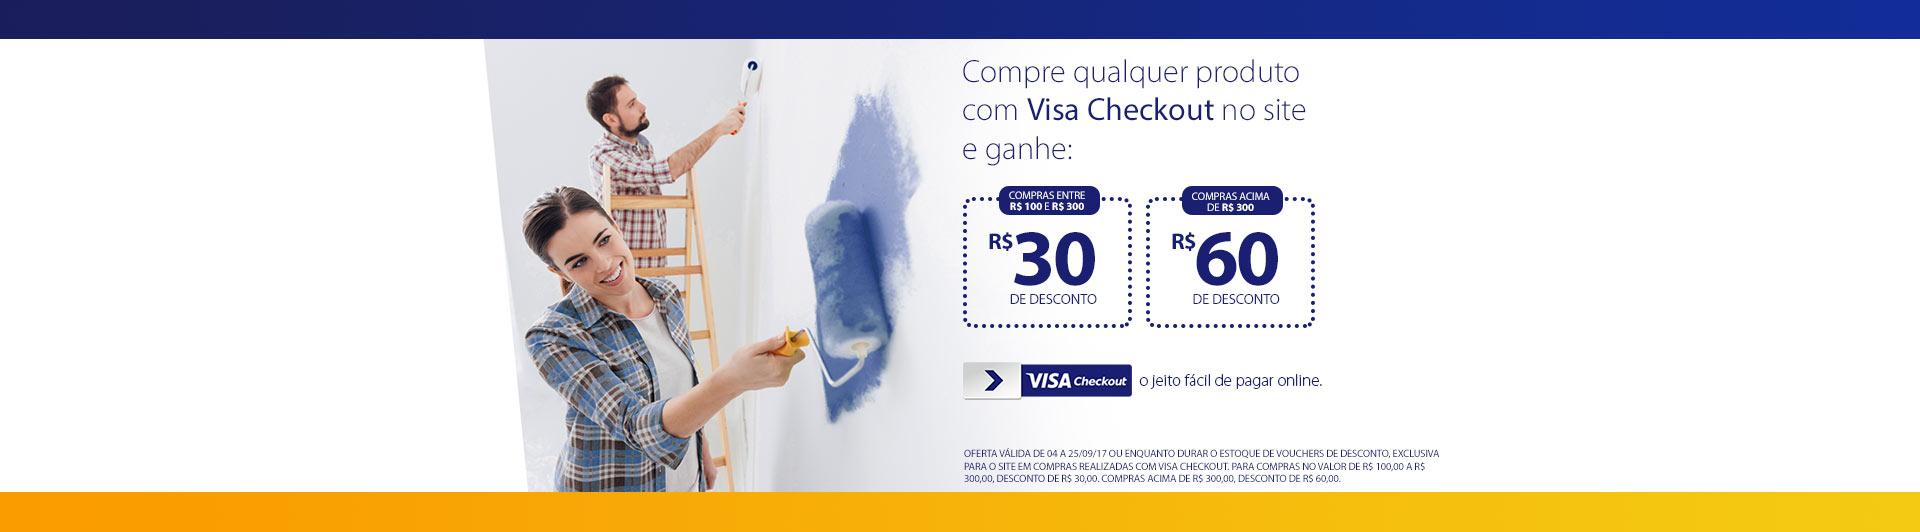 Banner - Visa Checkout